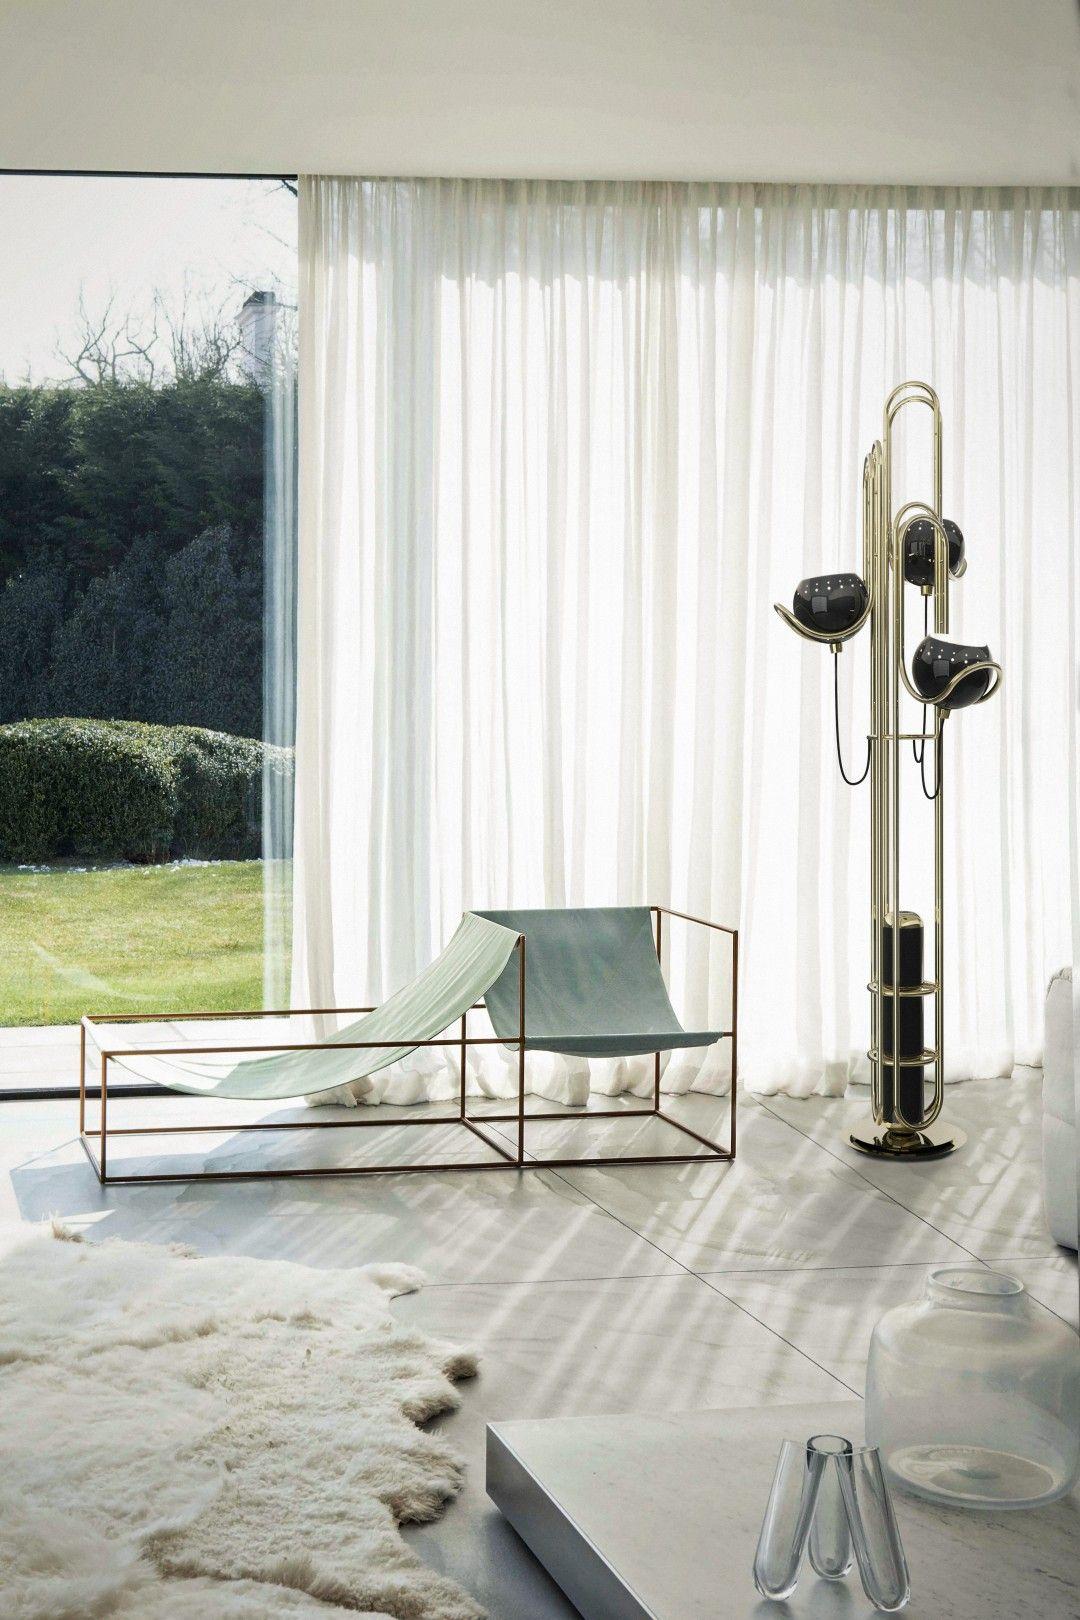 Quarz badezimmer ideen the hottest interior design trends for spring summer  get